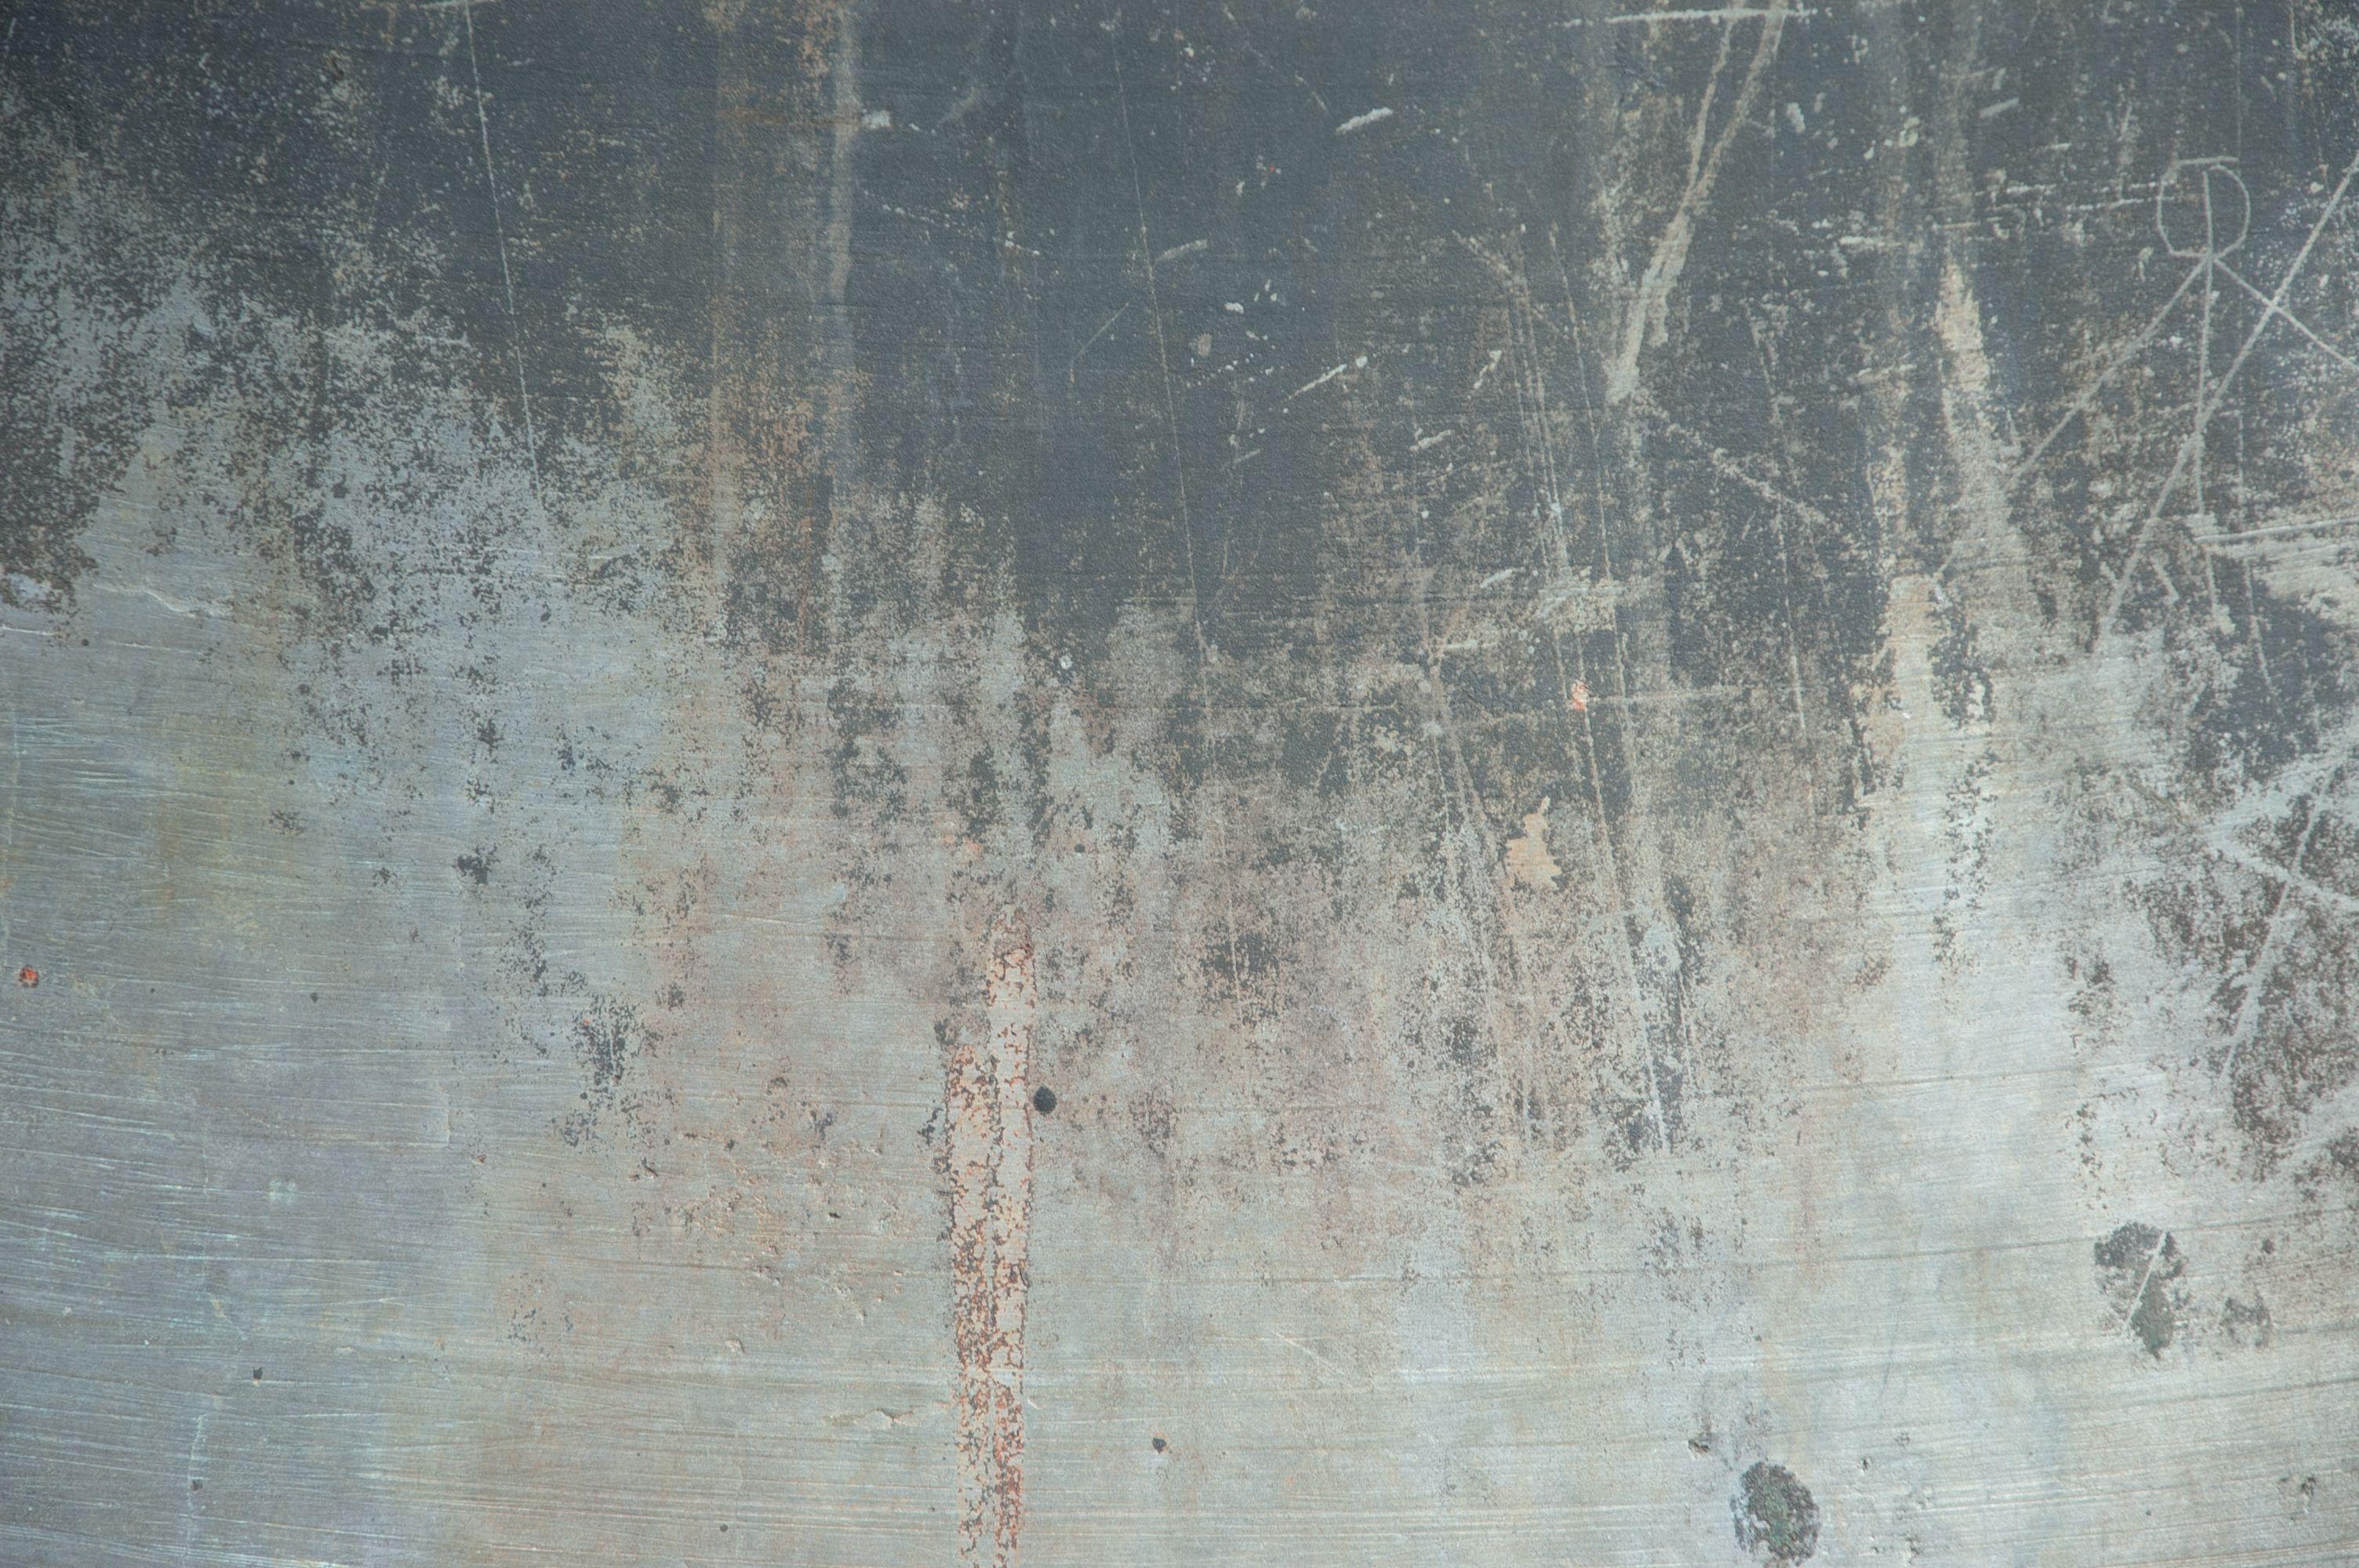 Free Texture Old Worn Metal Metal Texture Texture Free Textures